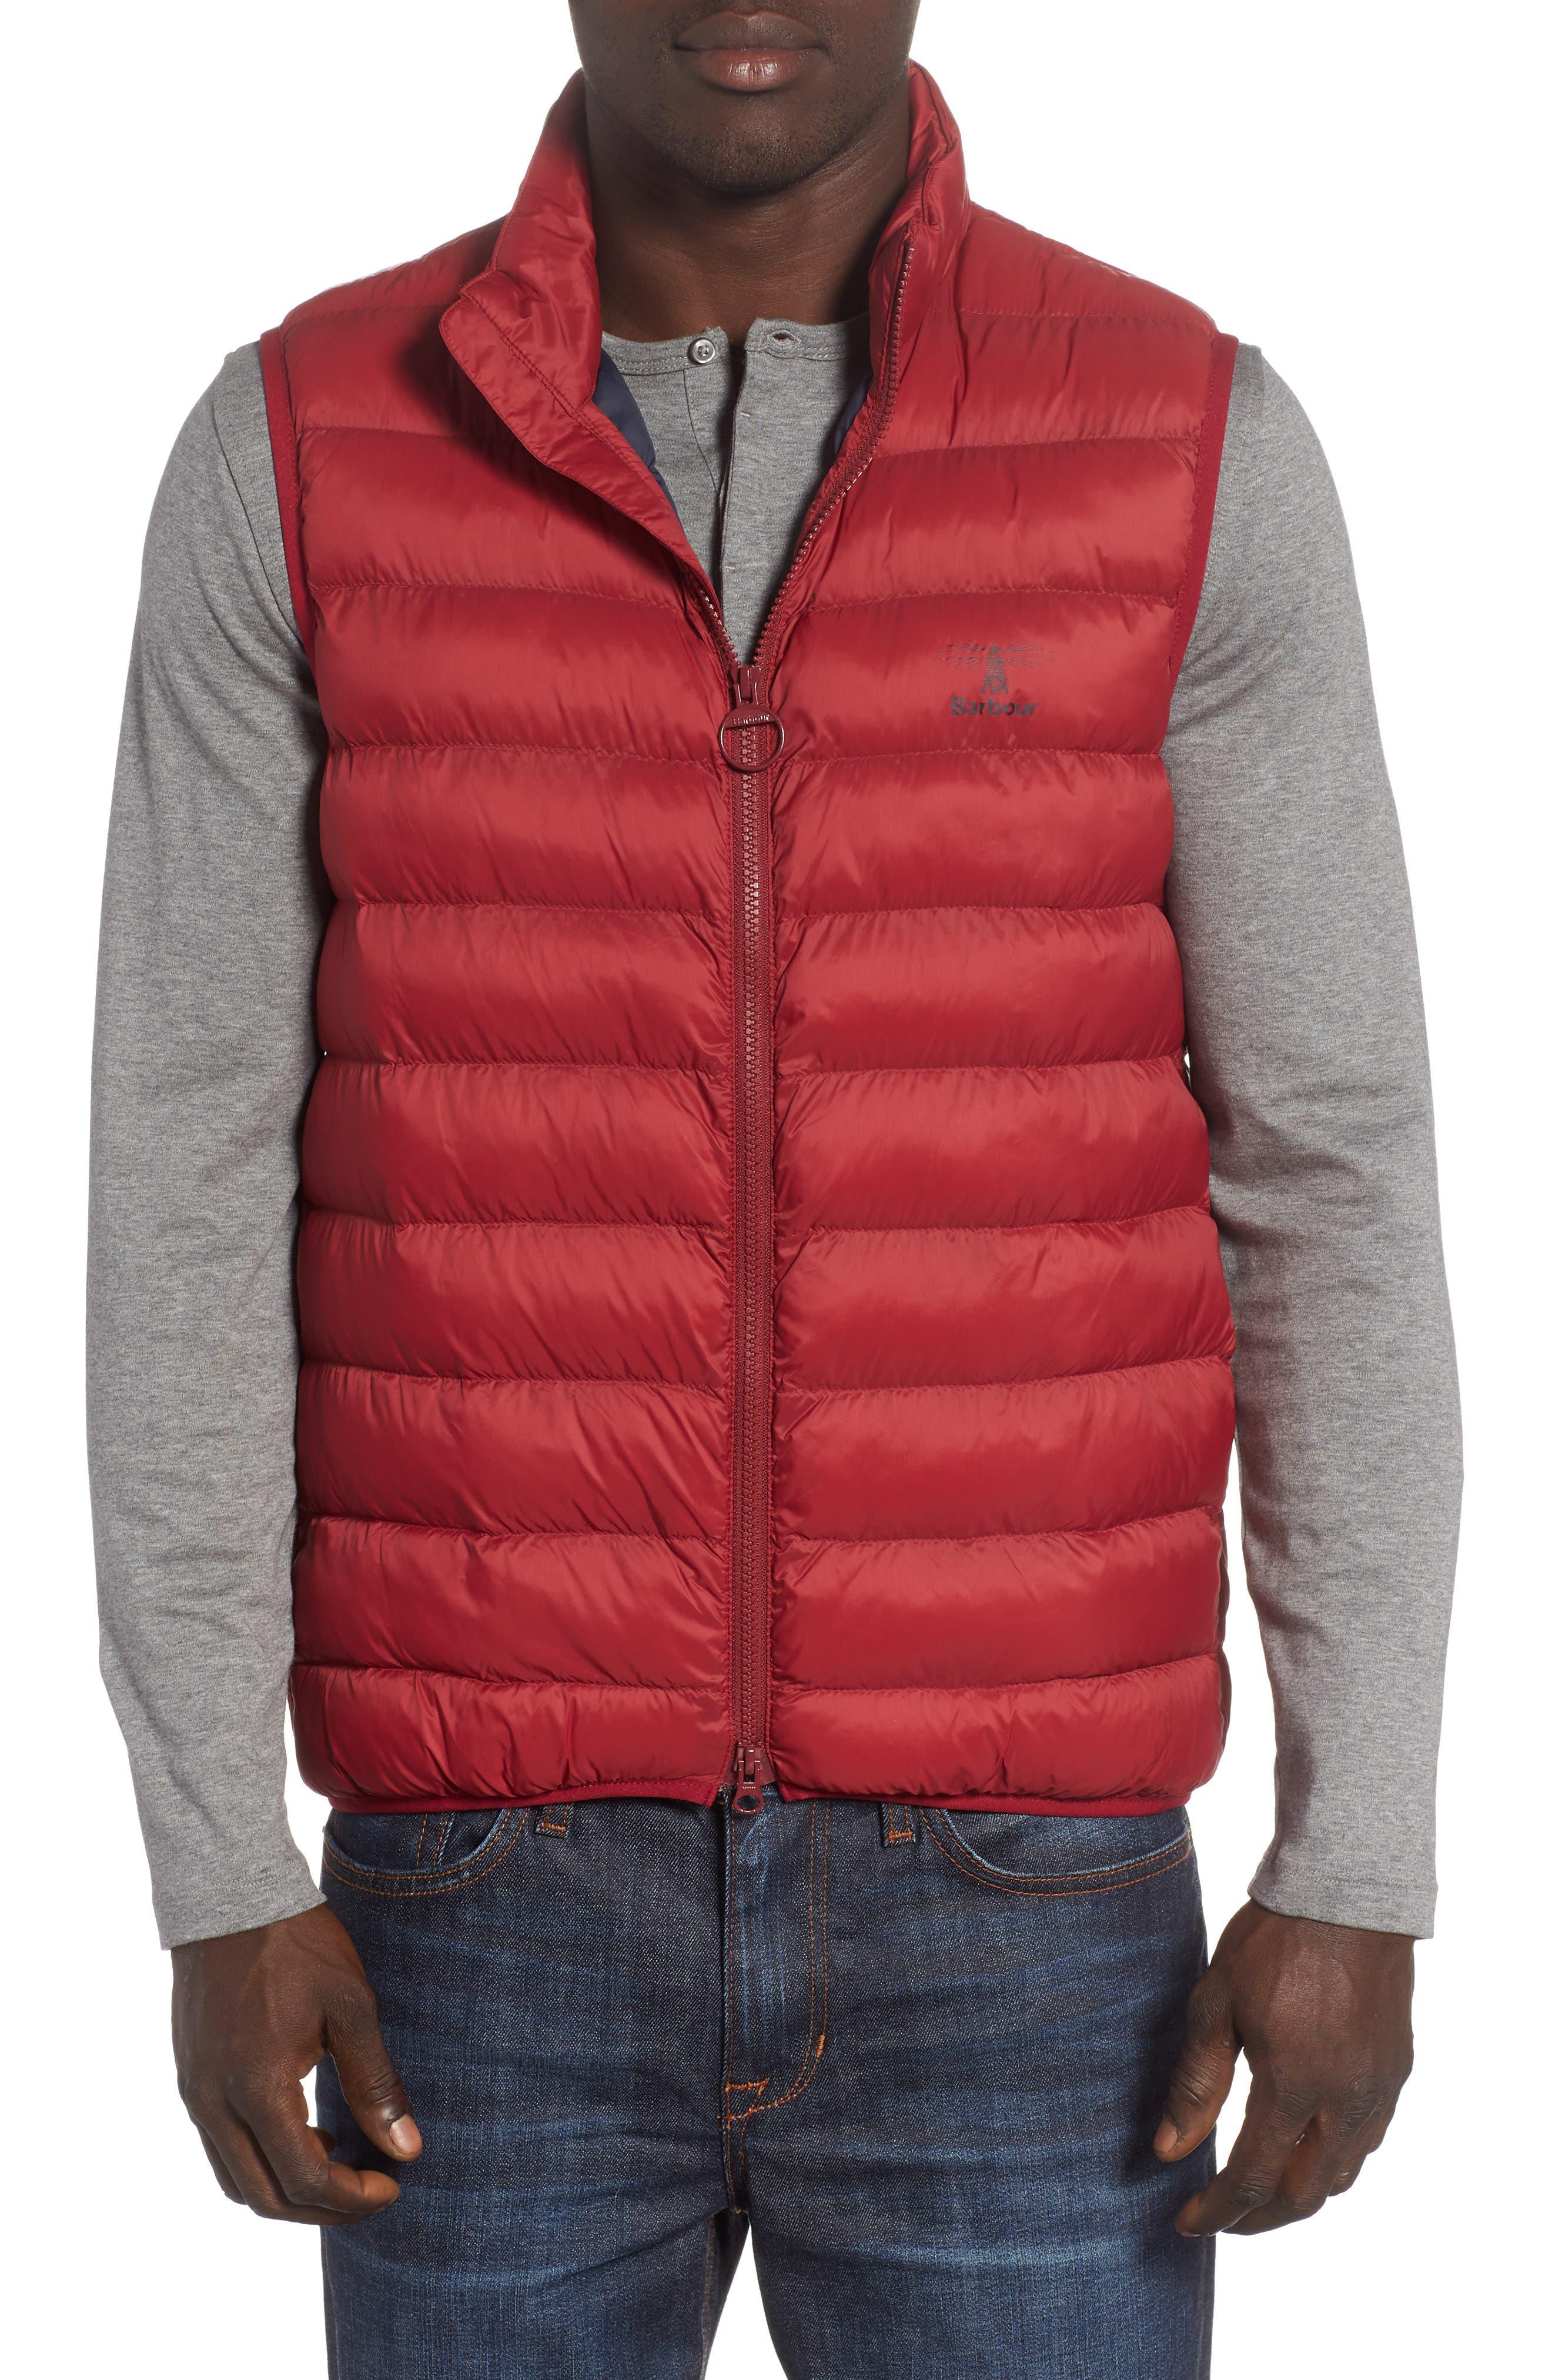 Askham Quilted Vest,                             Main thumbnail 1, color,                             BIKING RED